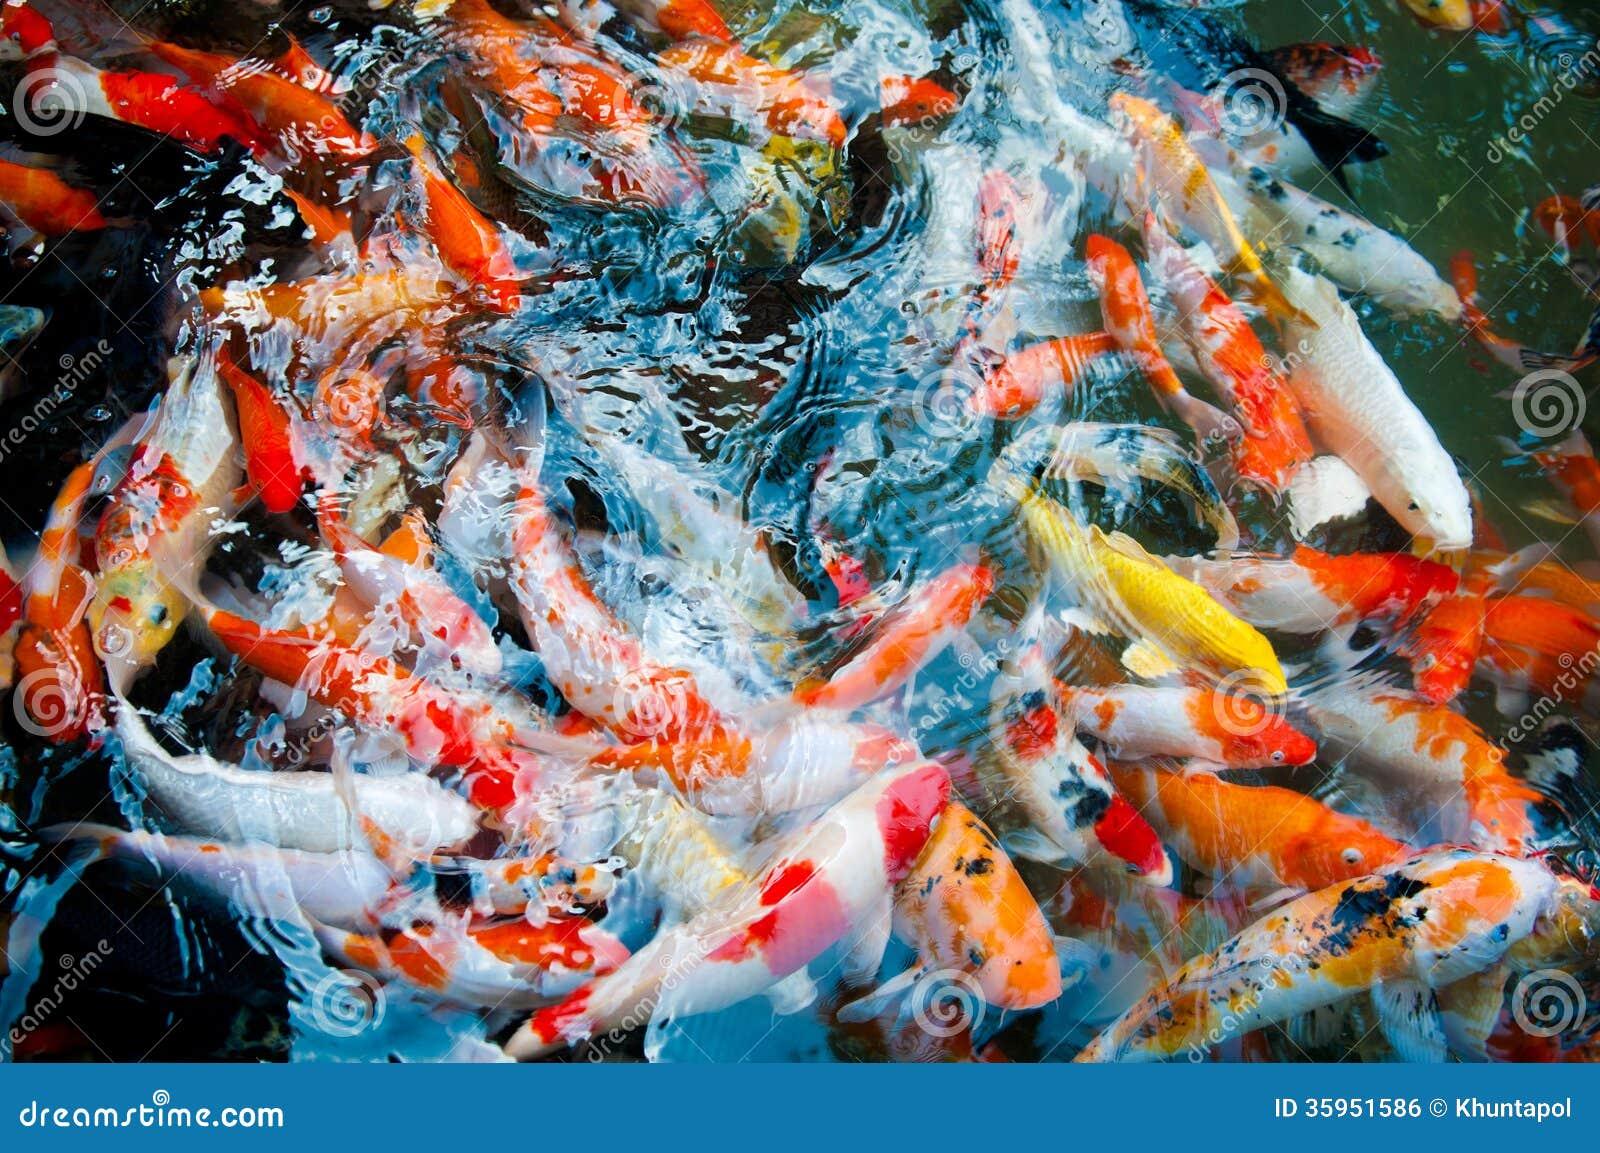 Koi or carp chinese fish in water stock photo image for Koi carp farm